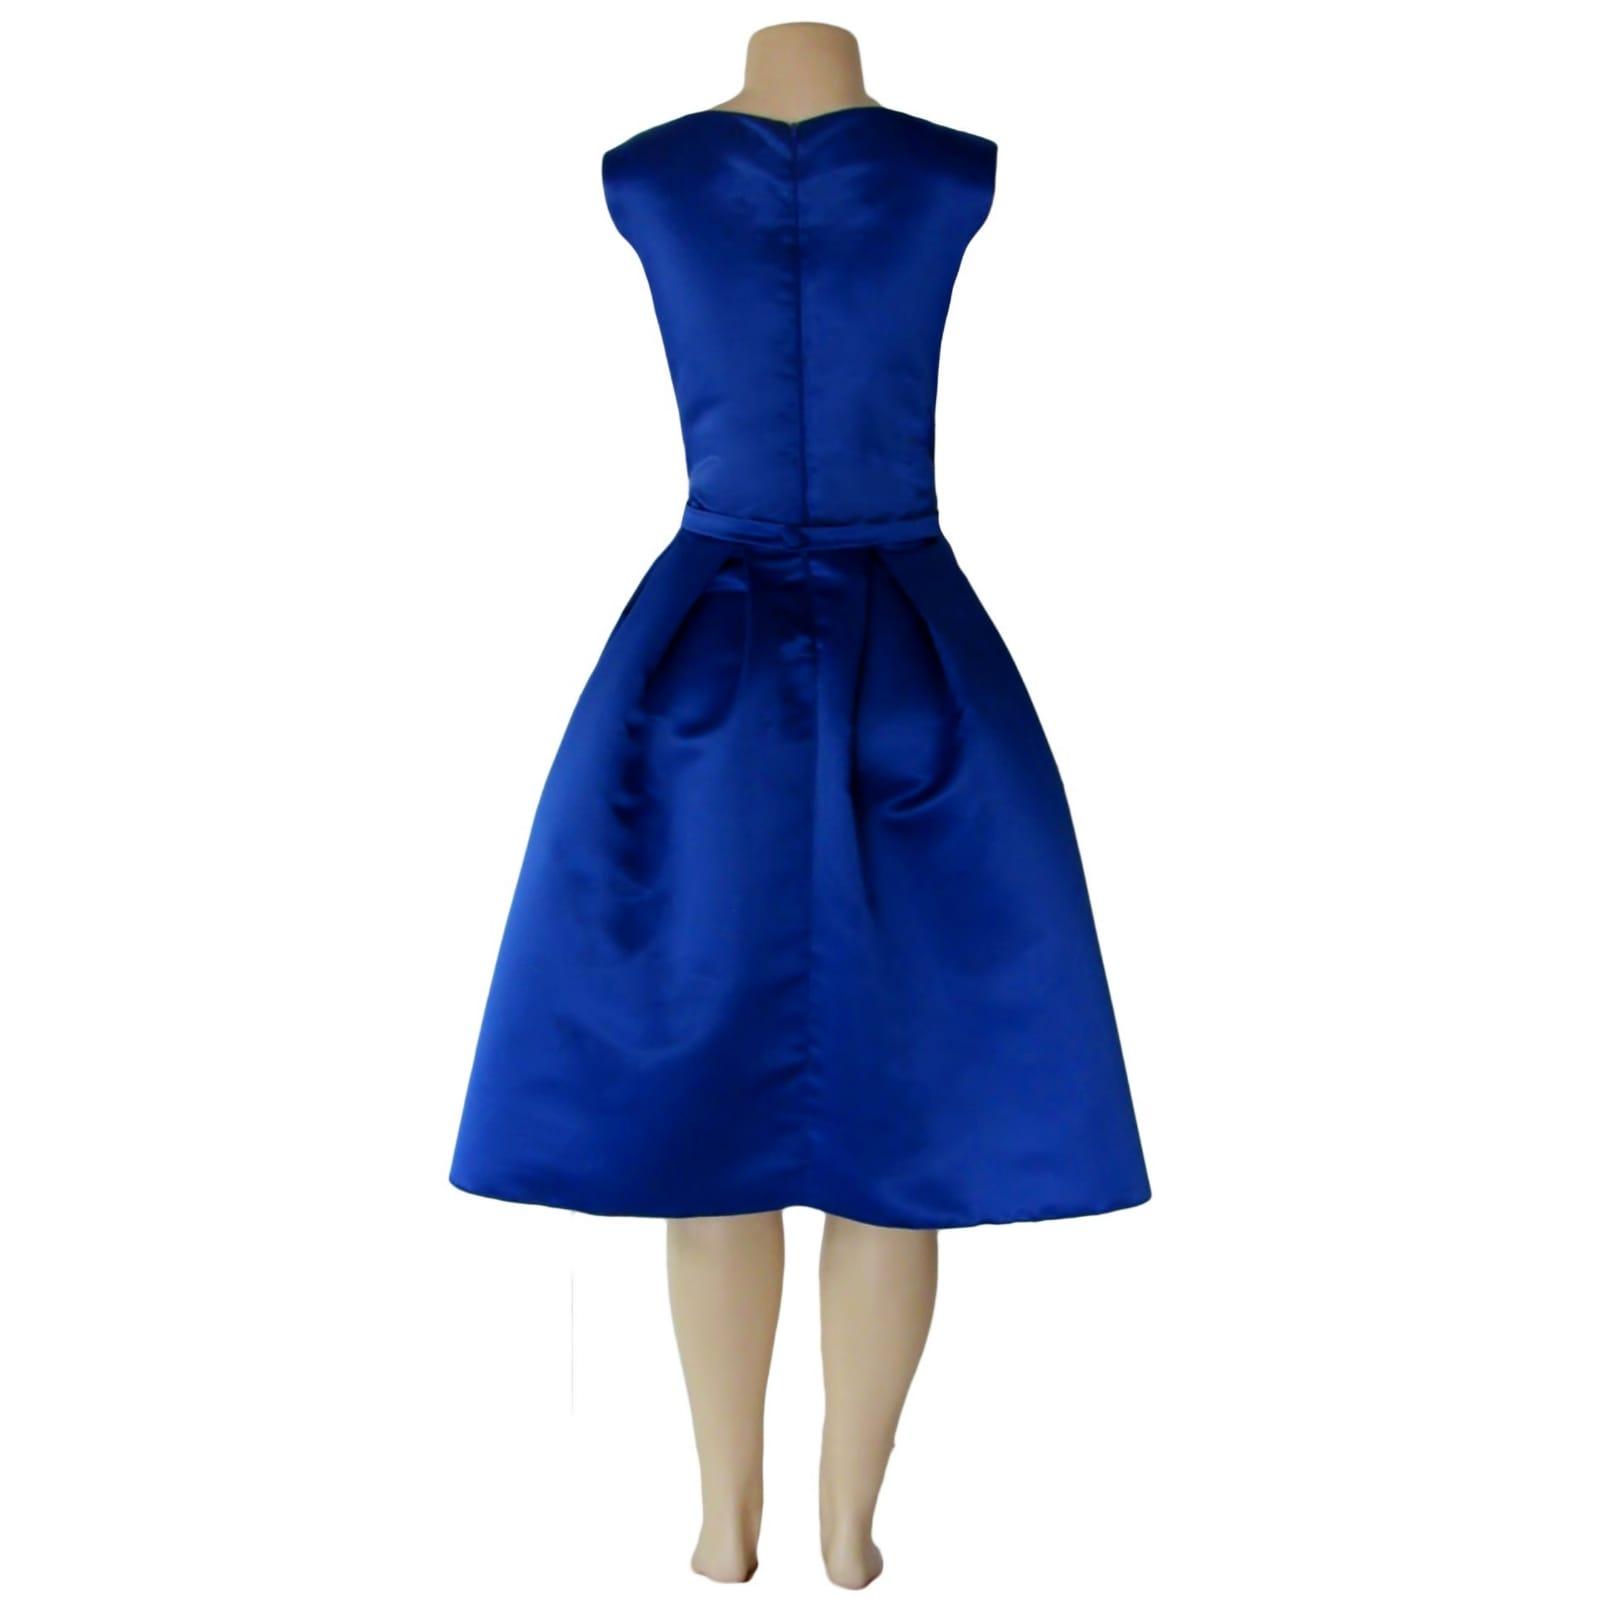 Vestido Curto Rendado Plissado Alças Finas Cor Azul Escuro